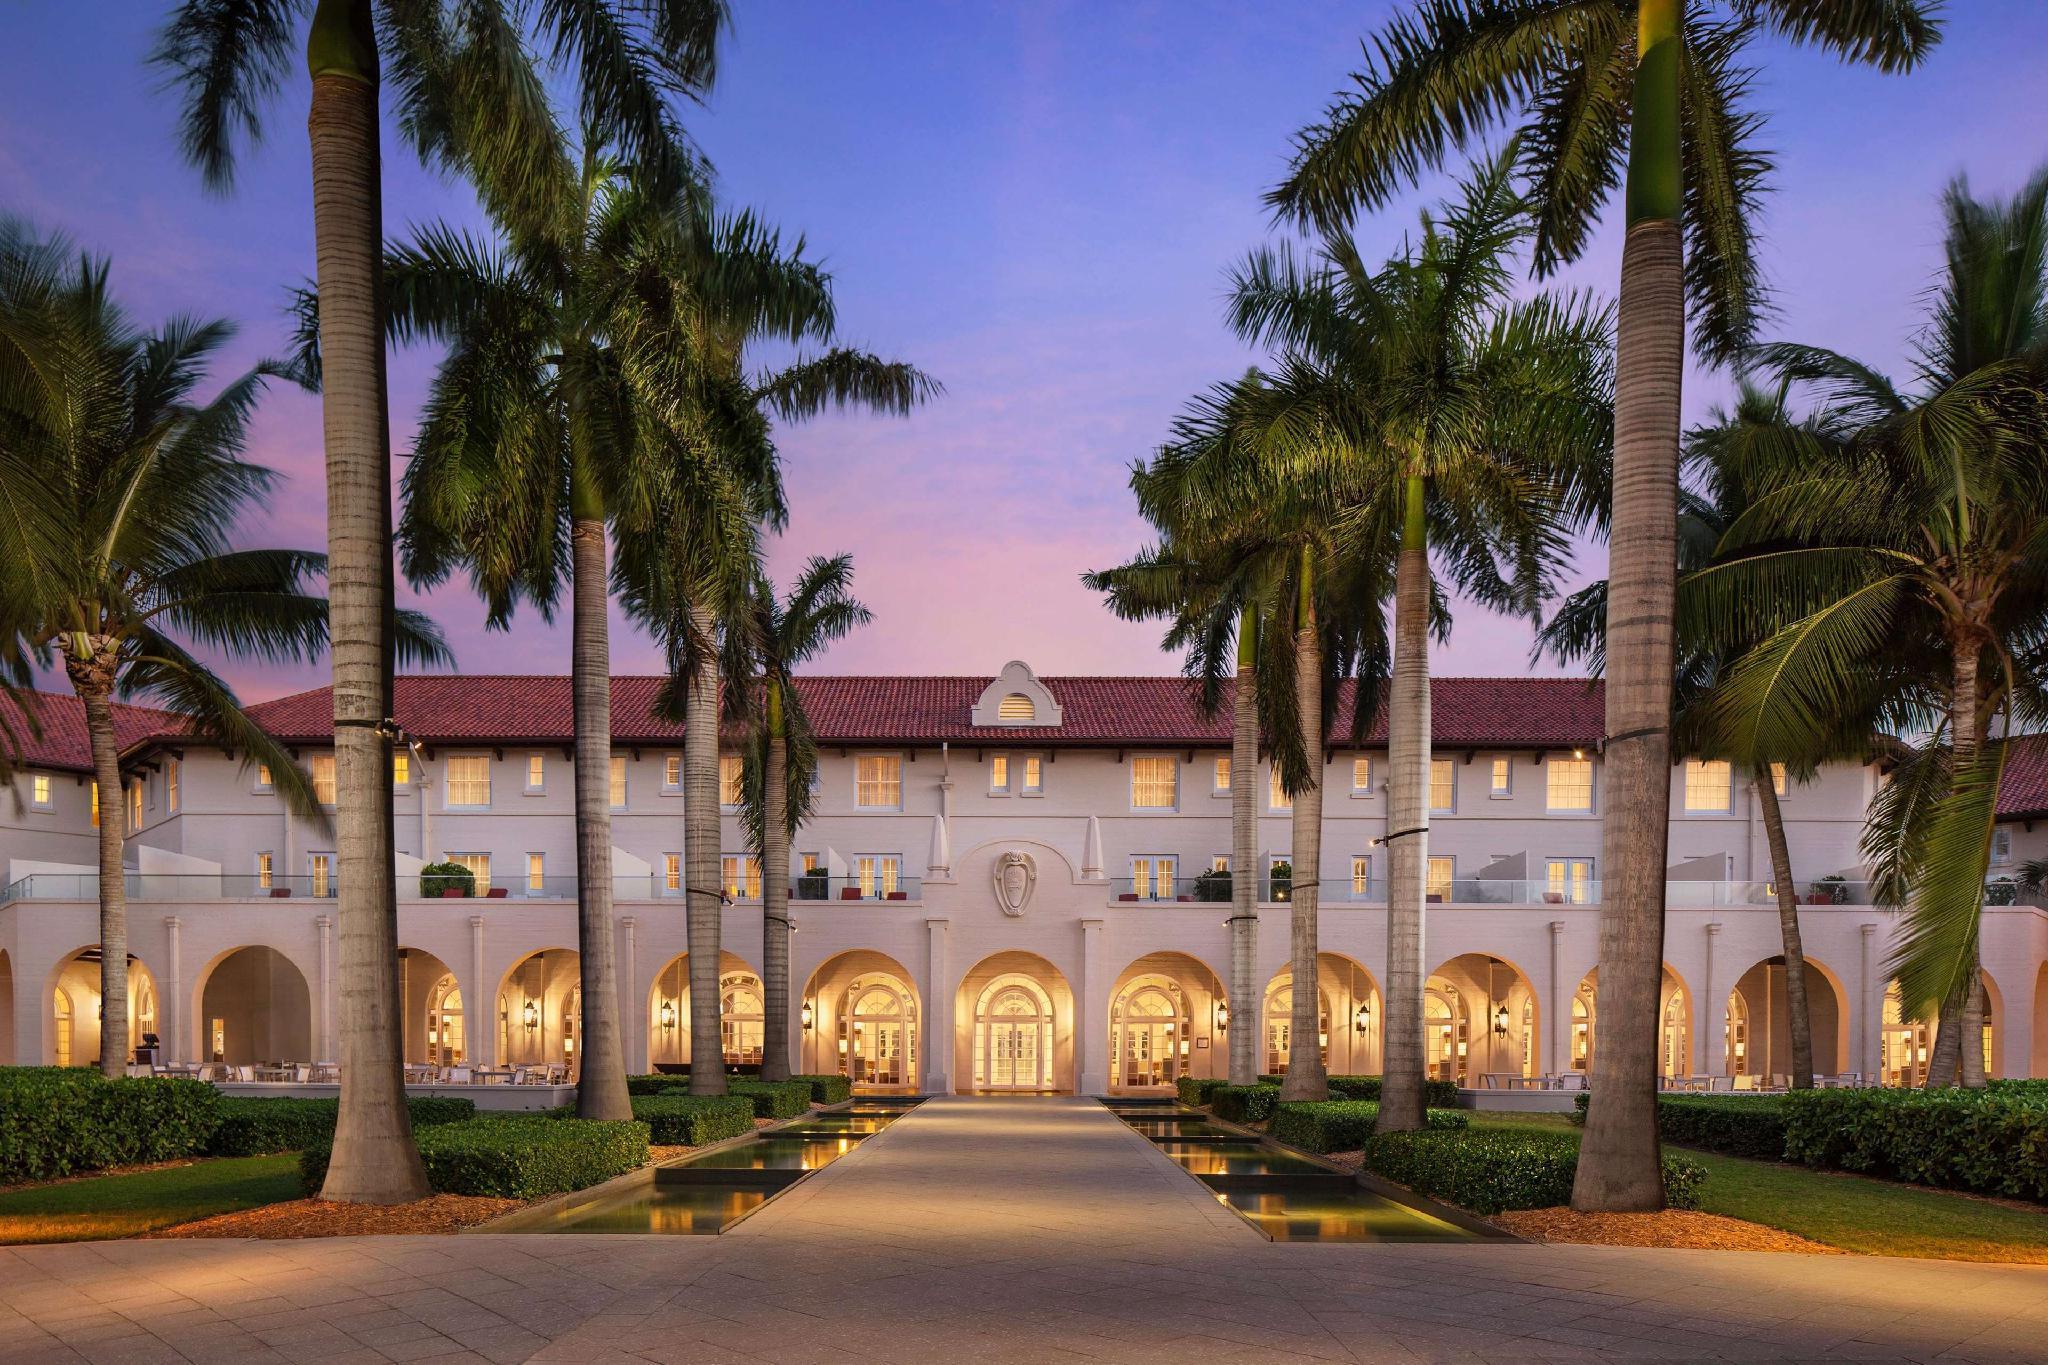 Casa Marina Key West - A Waldorf Astoria Resort image